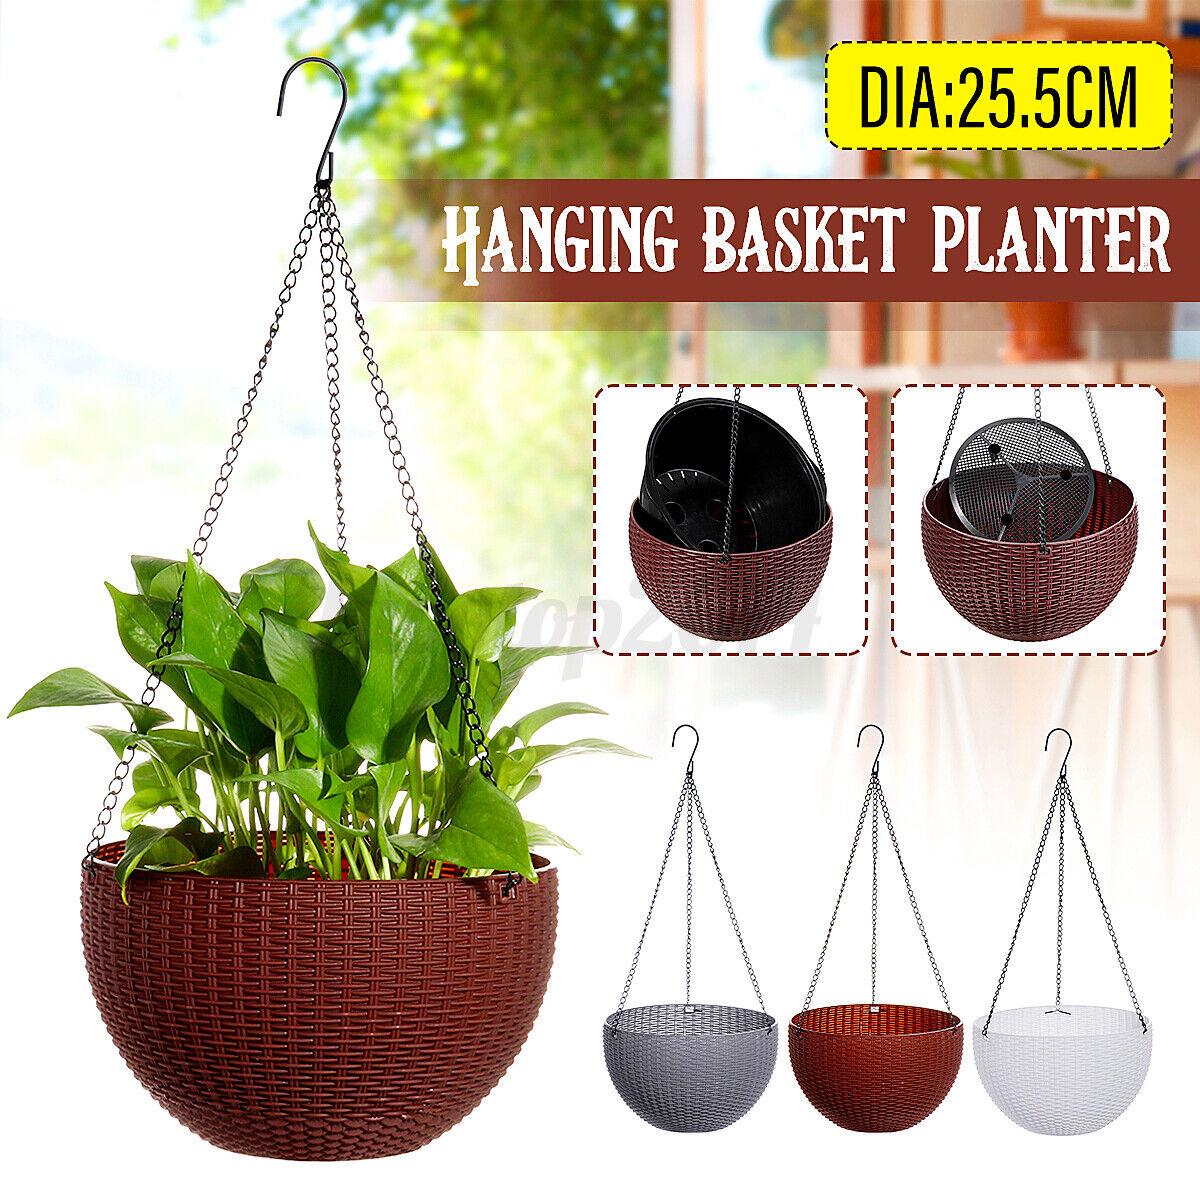 Hanging Flower Plant Round Pot Basket Planter Holder Garden Decor NEW